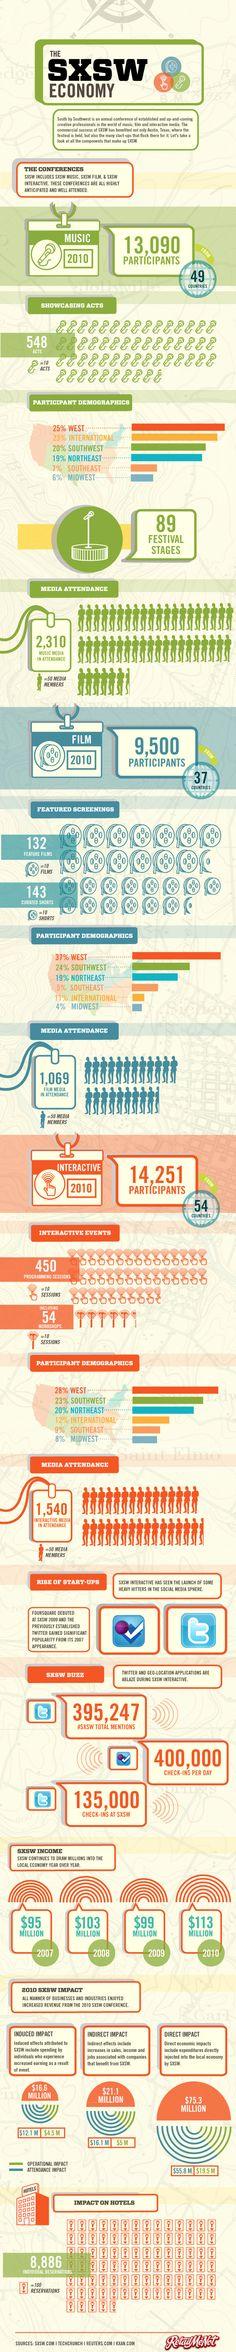 http://www.infographicsamples.com/dexters-victims/